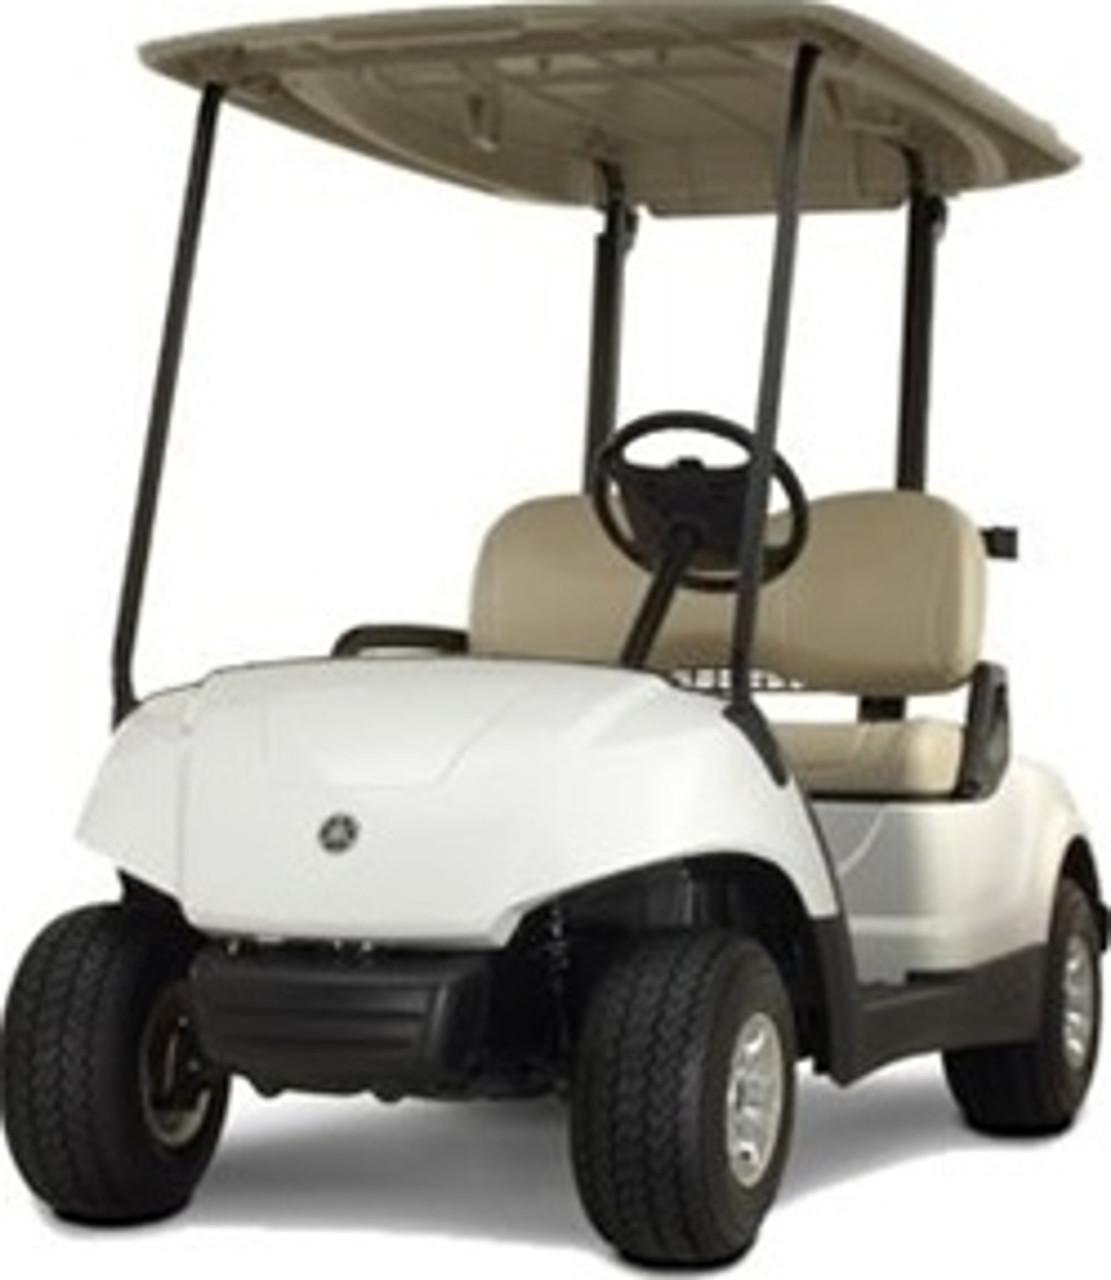 Yamaha Golf Cart Tune Up Kits